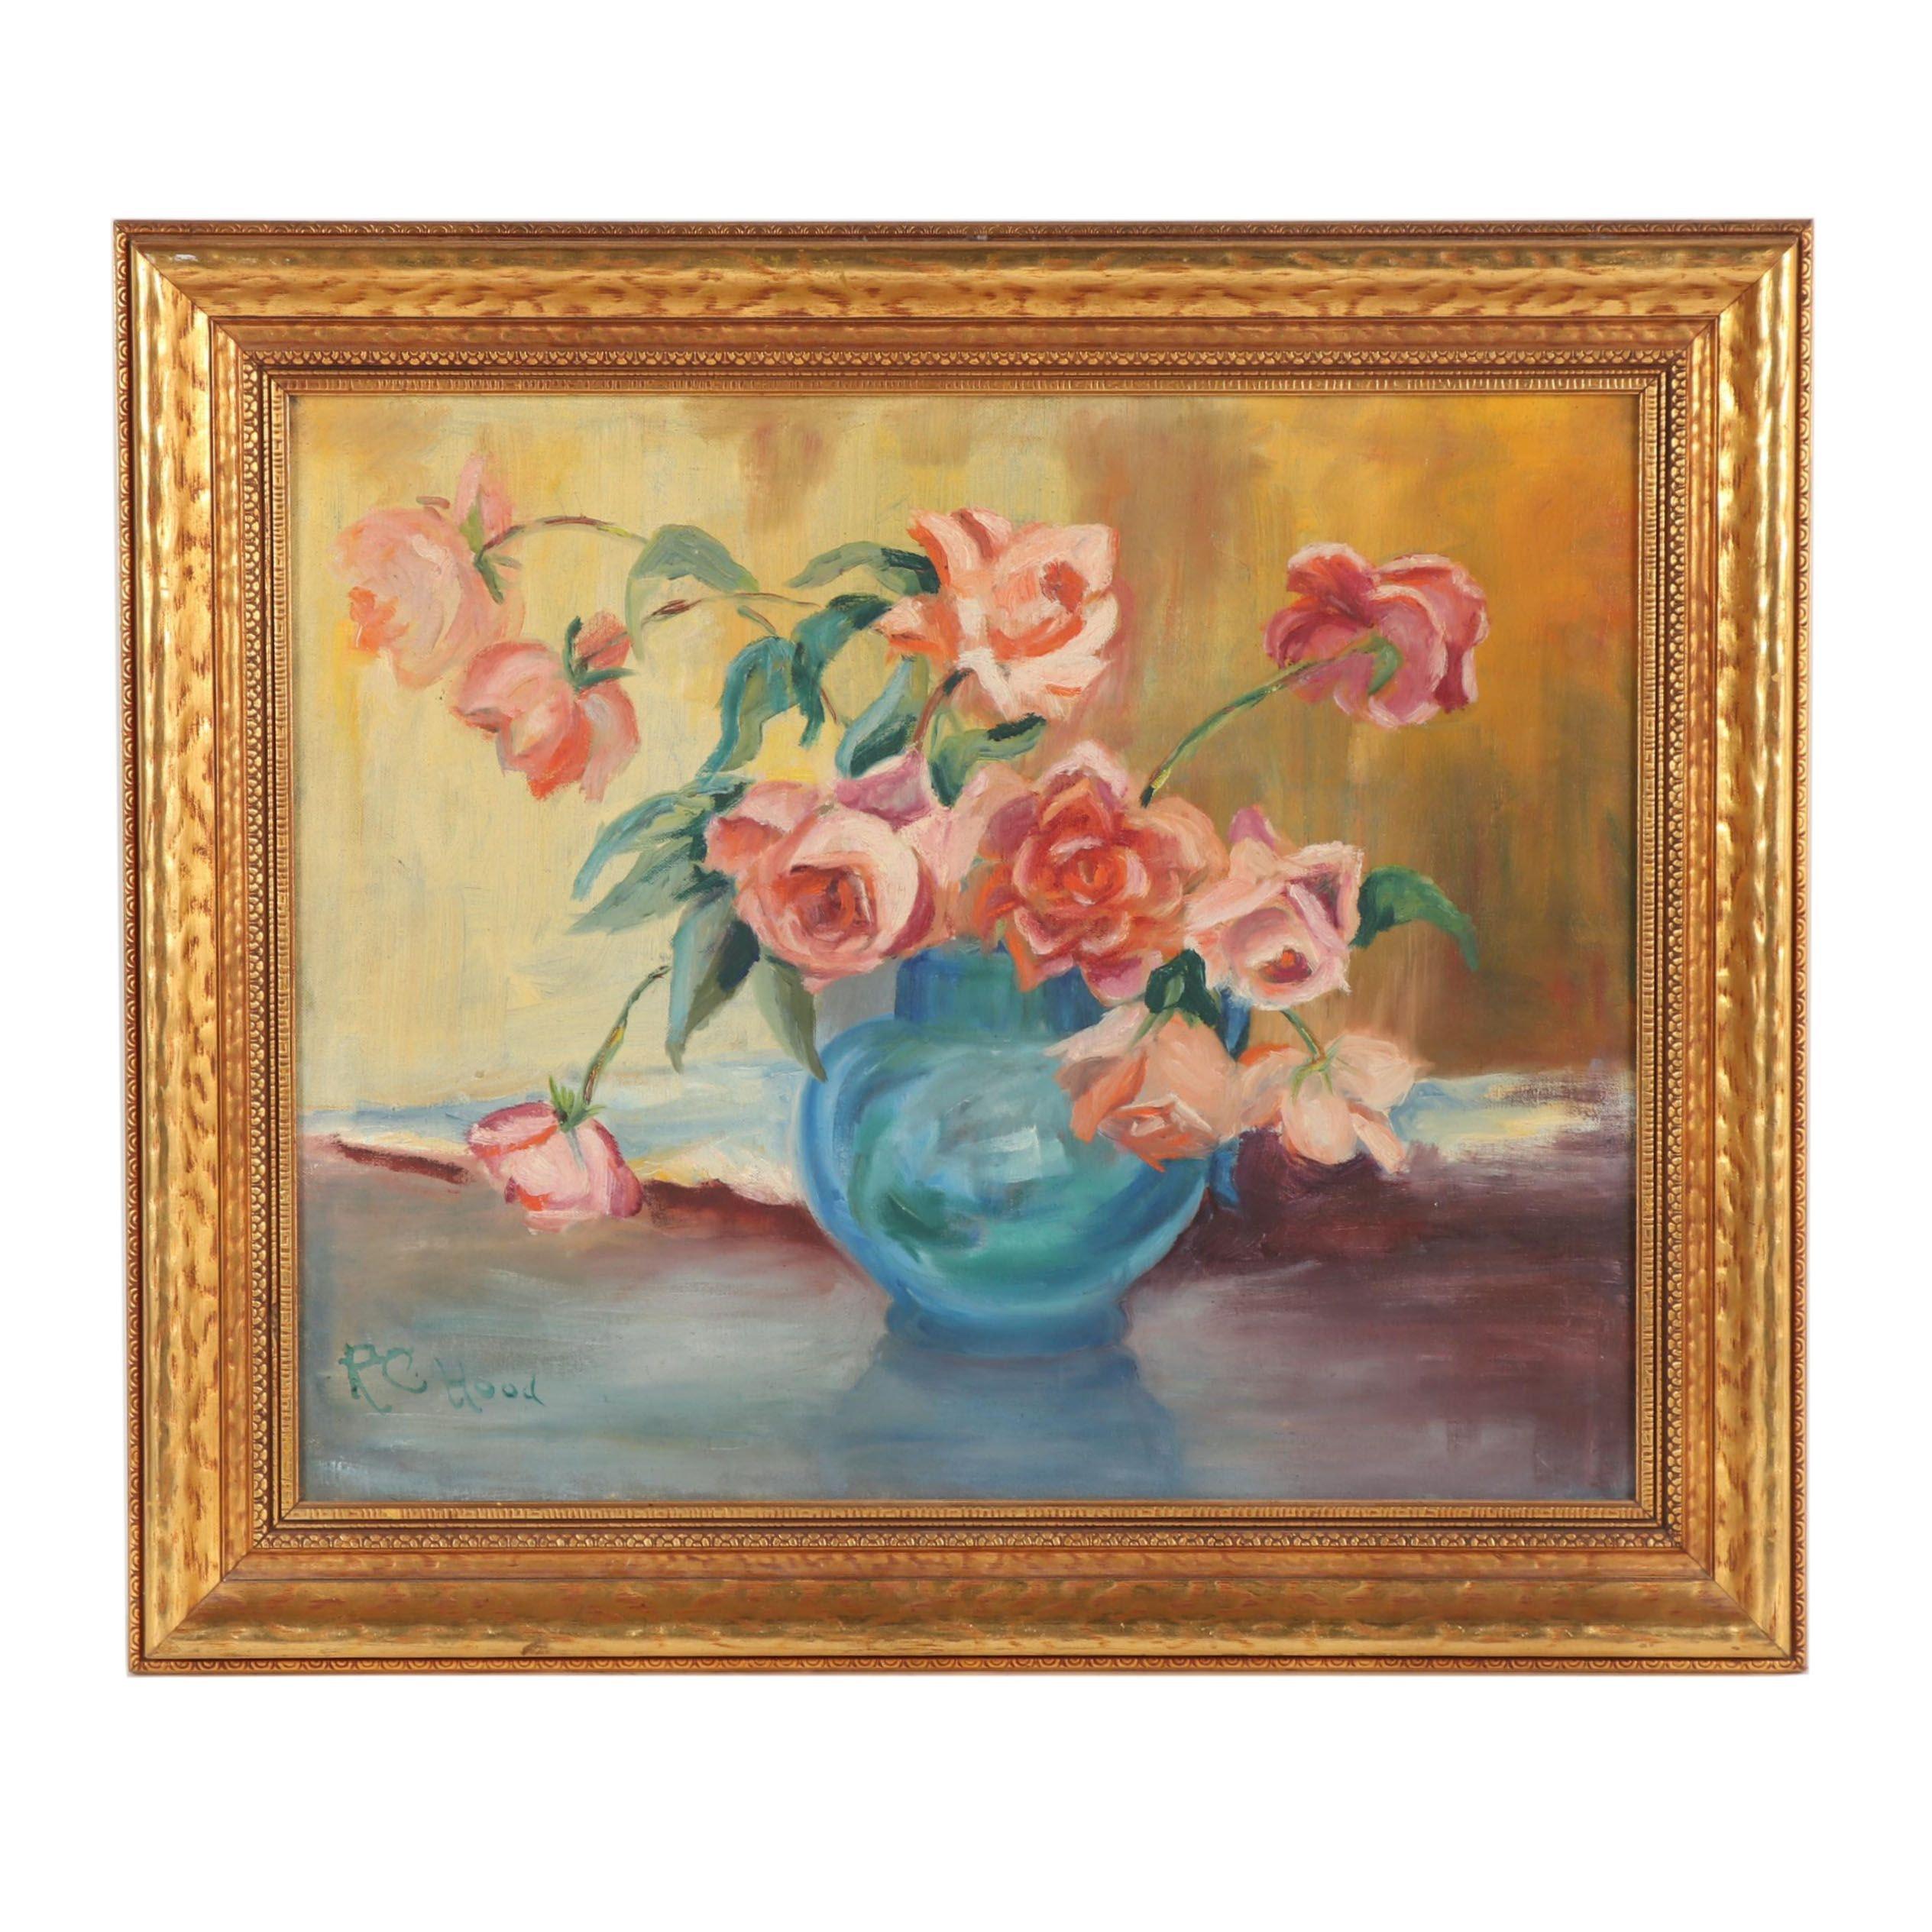 R.C. Hood Floral Still Life Oil Painting